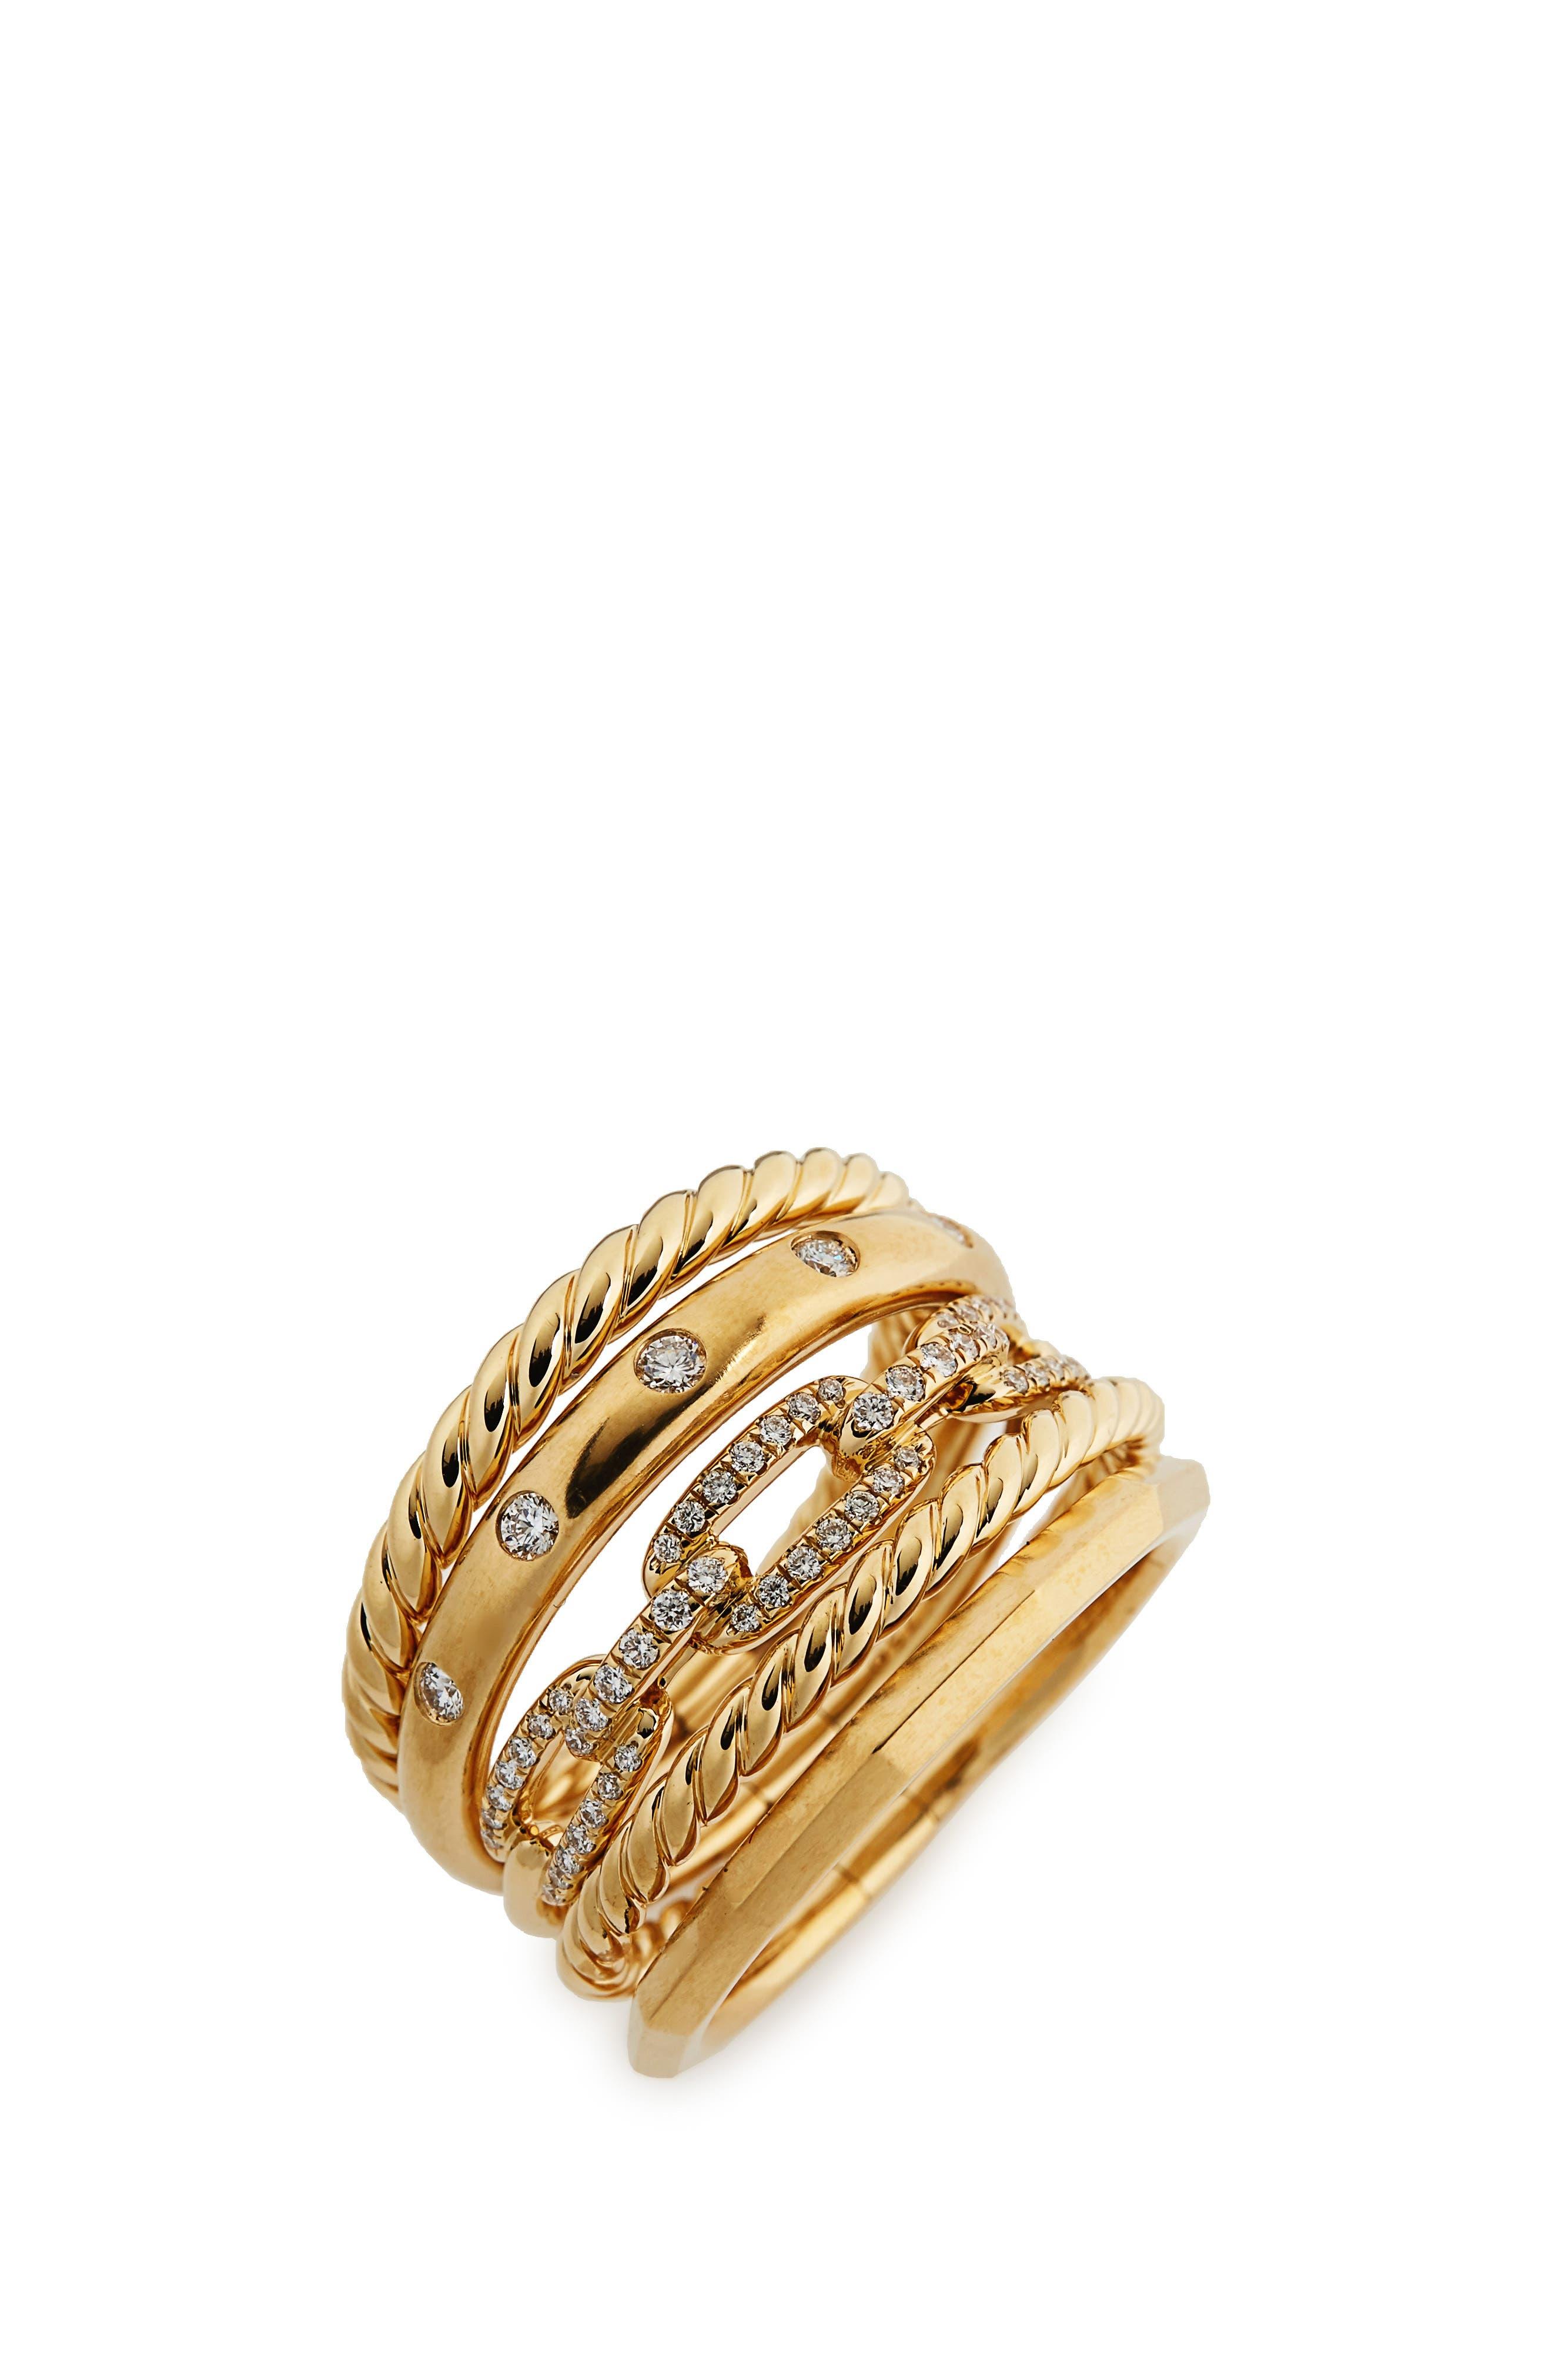 Main Image - David Yurman Stax Wide Ring with Diamonds in 18K Gold, 15mm